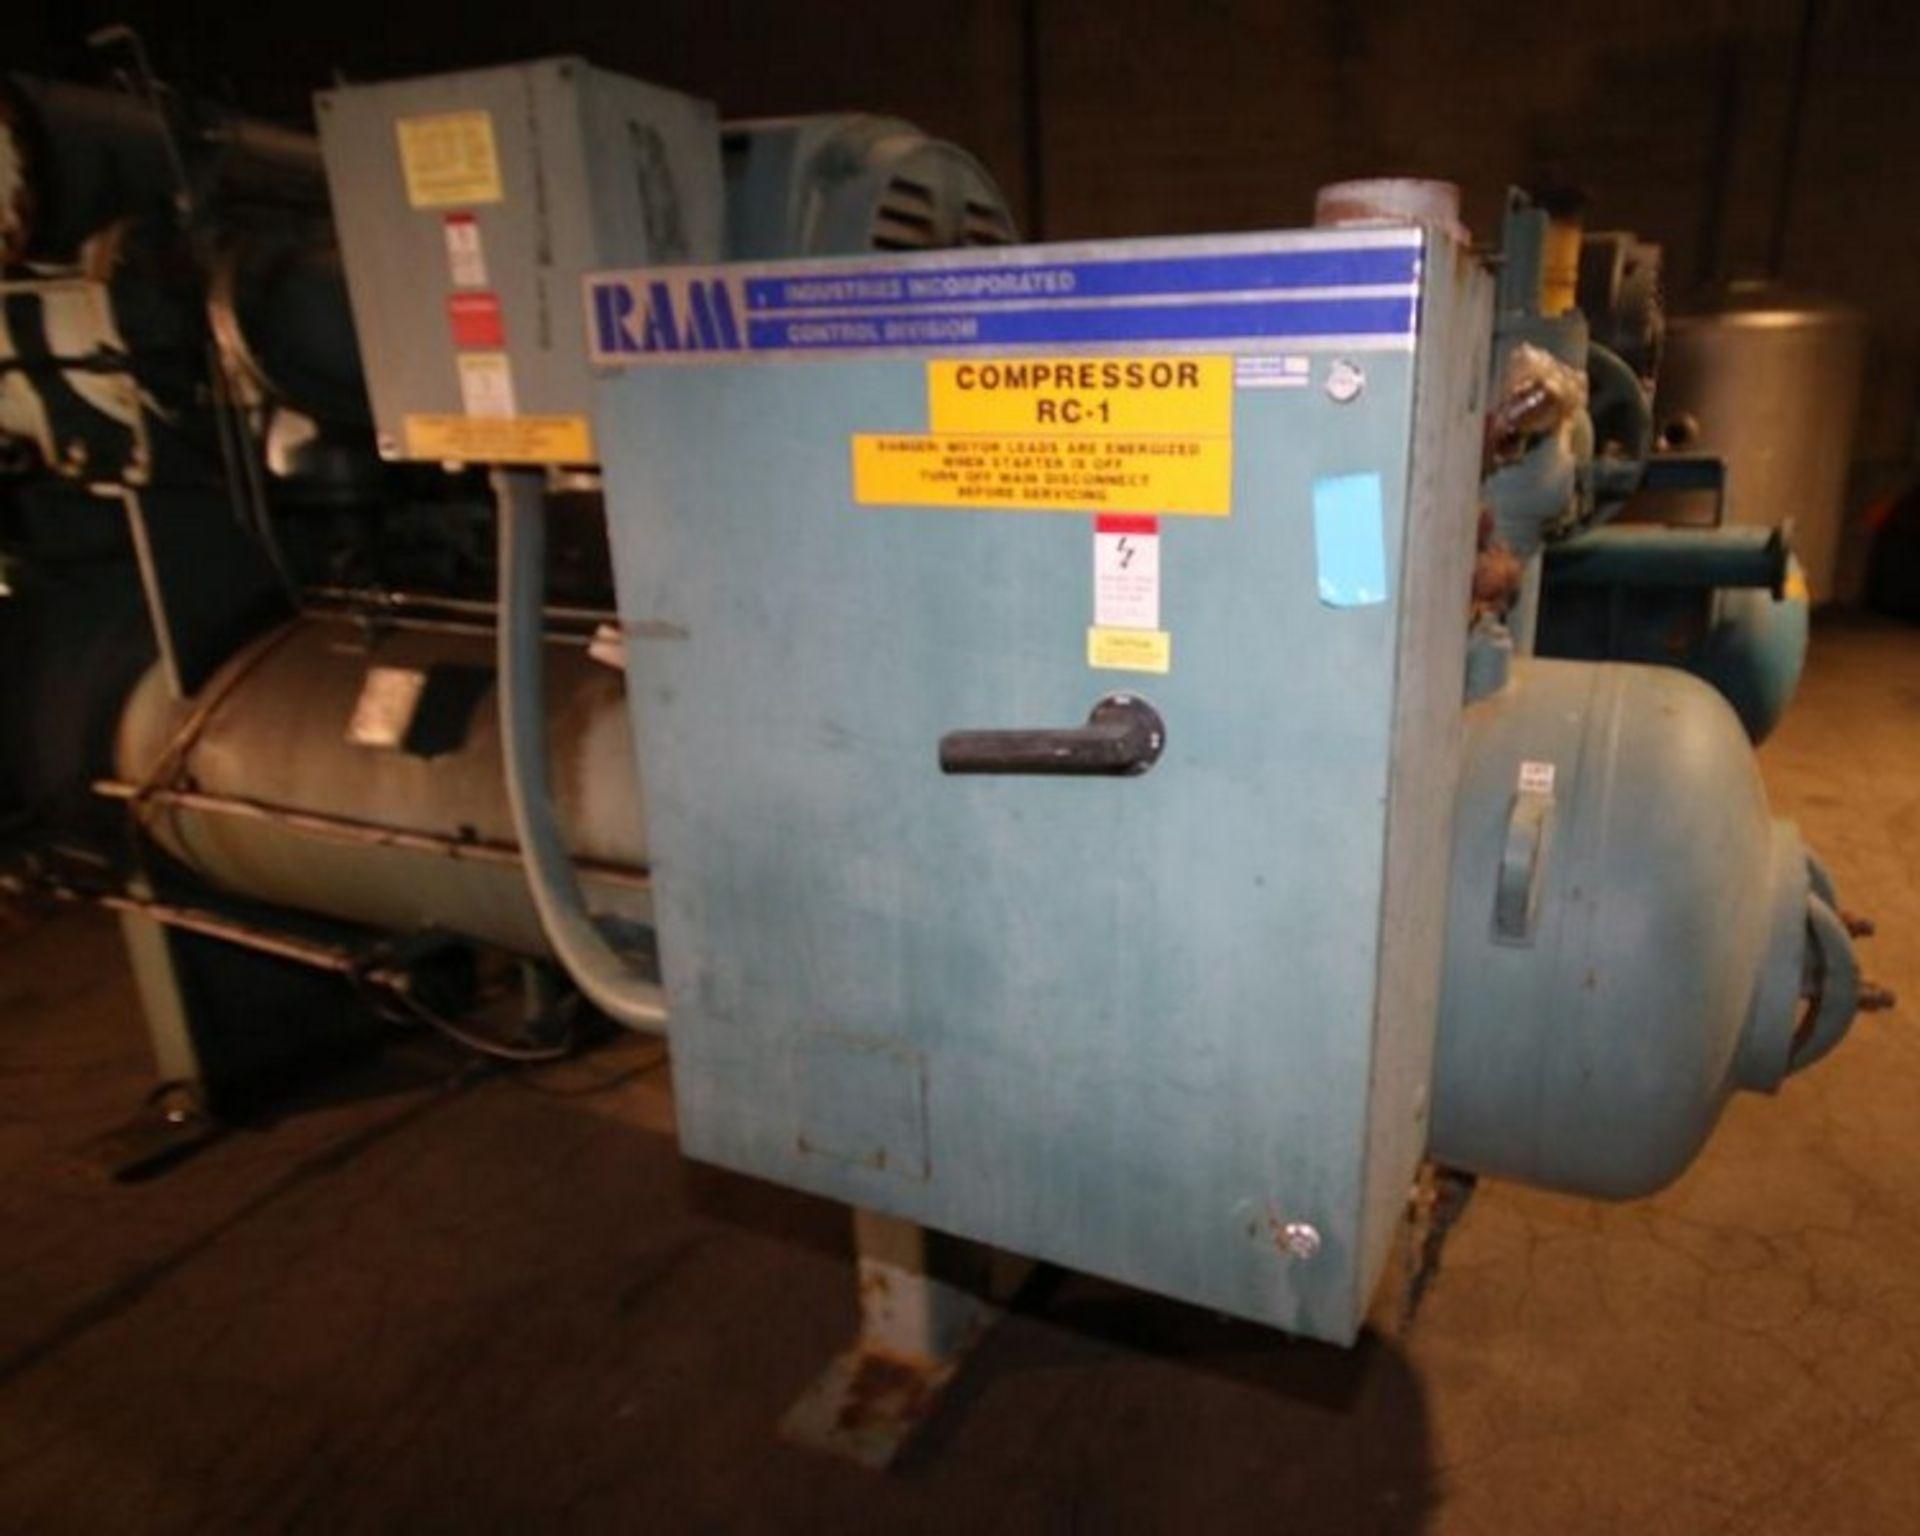 Lot 21 - 2000 Frick hp 350 hp Screw Ammonia Compressor, Frame Model RWF 134 H, SN F0057UFMNLIGA03, Screw Head